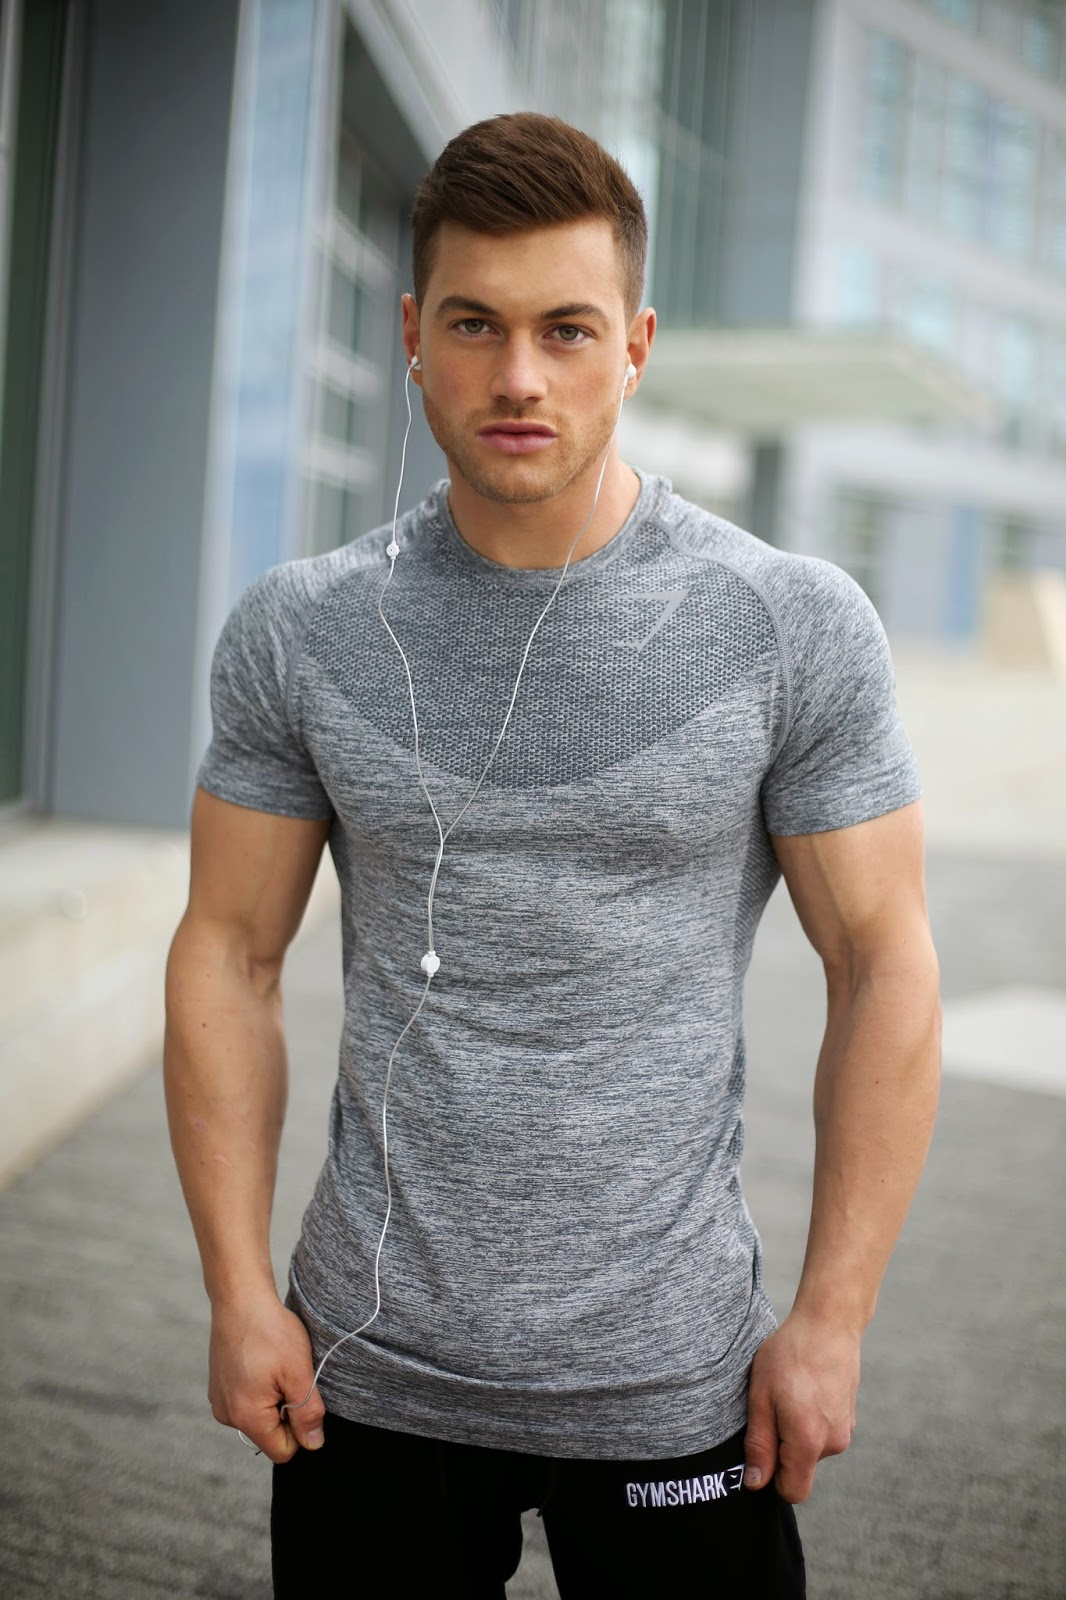 Ali Gordon Fashion Amp Fitness Gym Shark